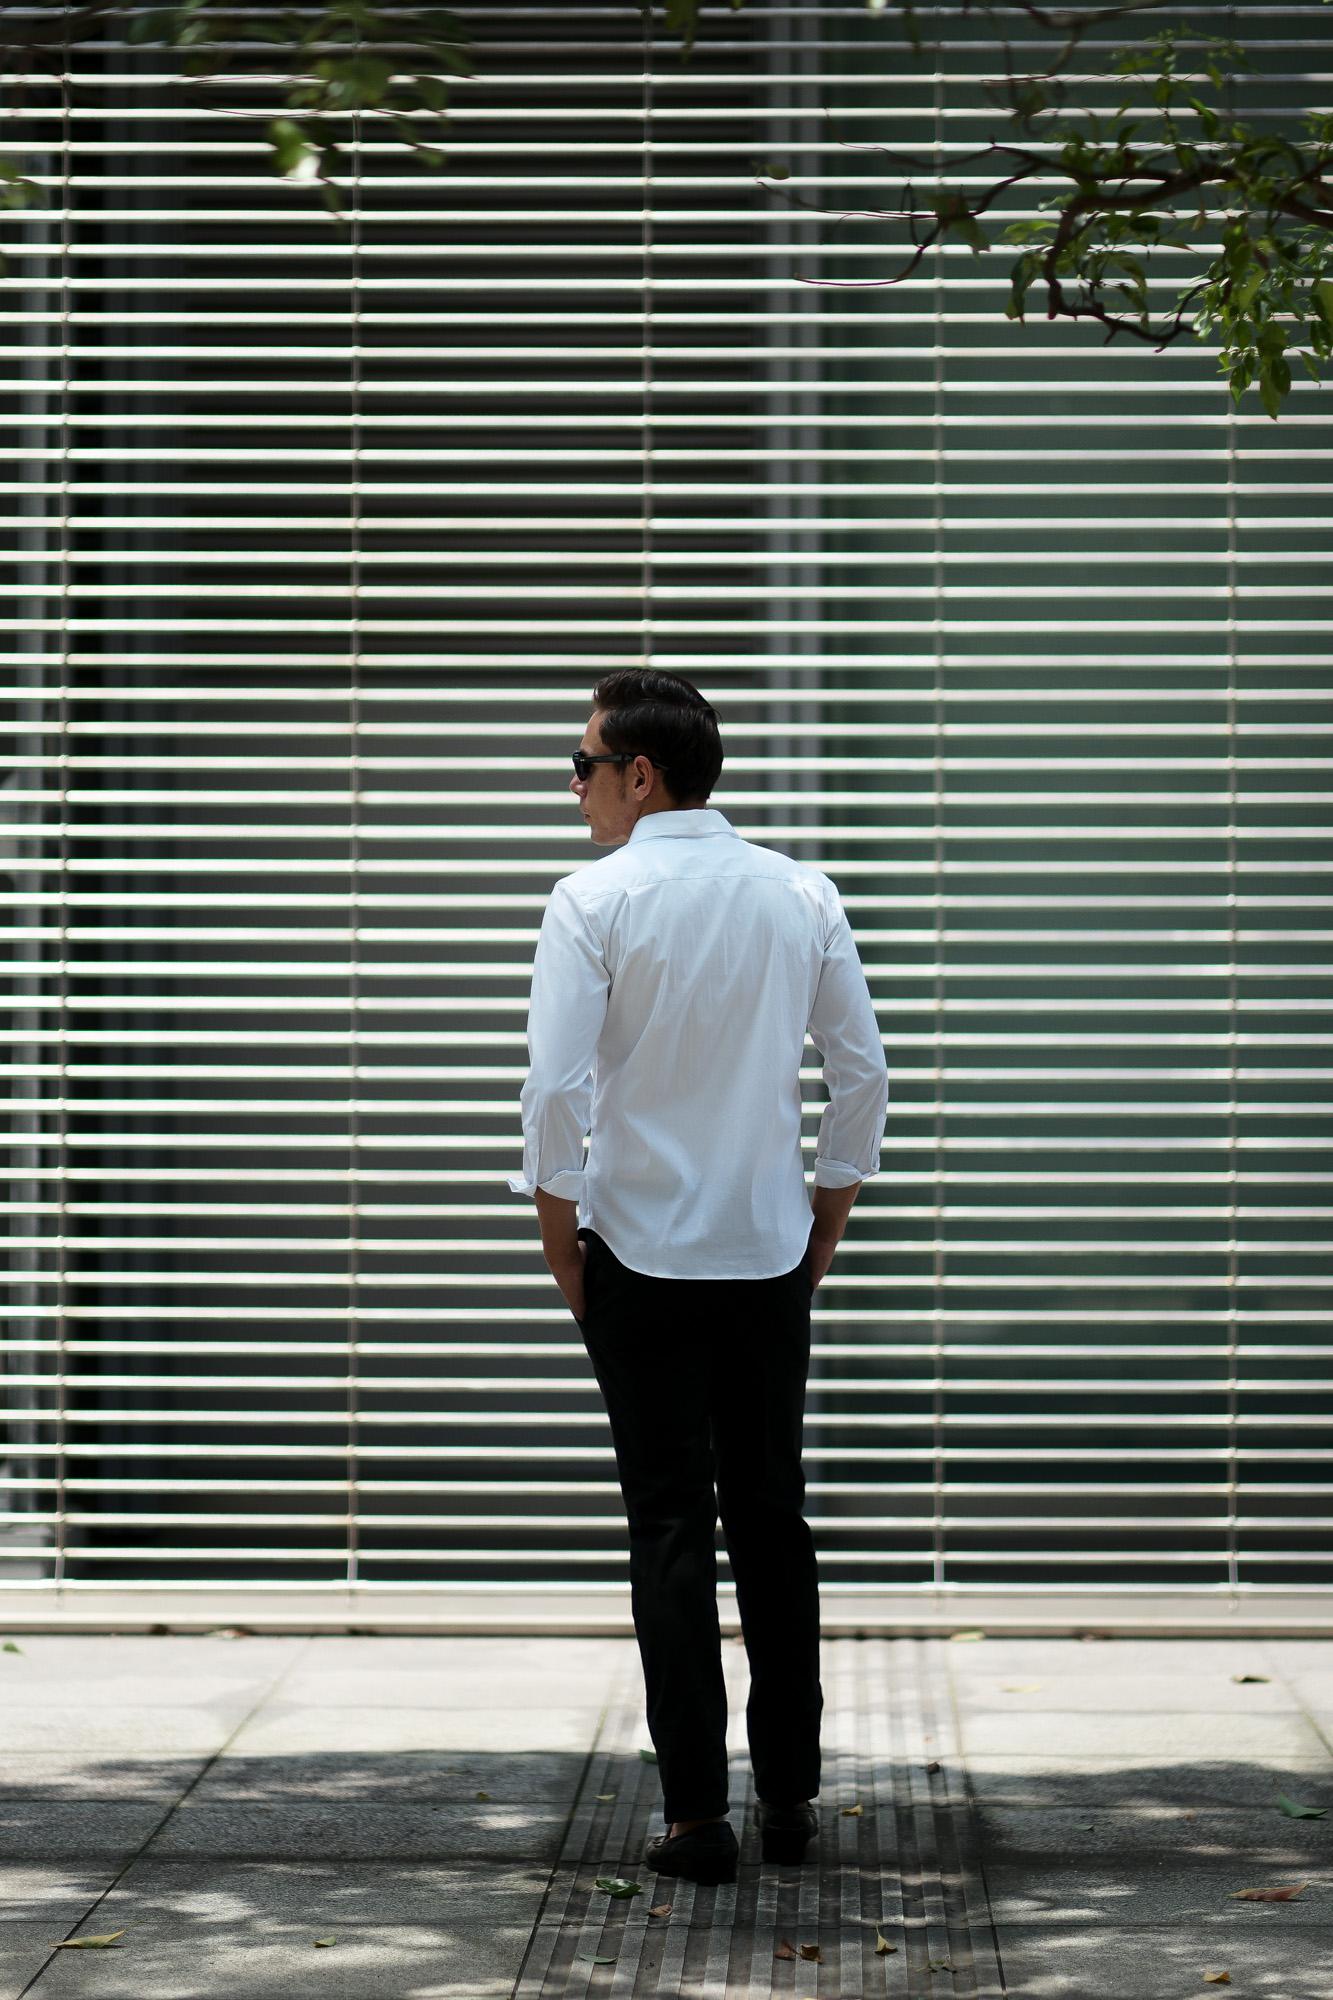 Cuervo (クエルボ) Sartoria Collection (サルトリア コレクション) Pier(ピエル) STRETCH COTTON ストレッチコットン シャツ WHITE(ホワイト) MADE IN ITALY (イタリア製) 2020 イタリアシャツ 愛知 名古屋 altoediritto アルトエデリット